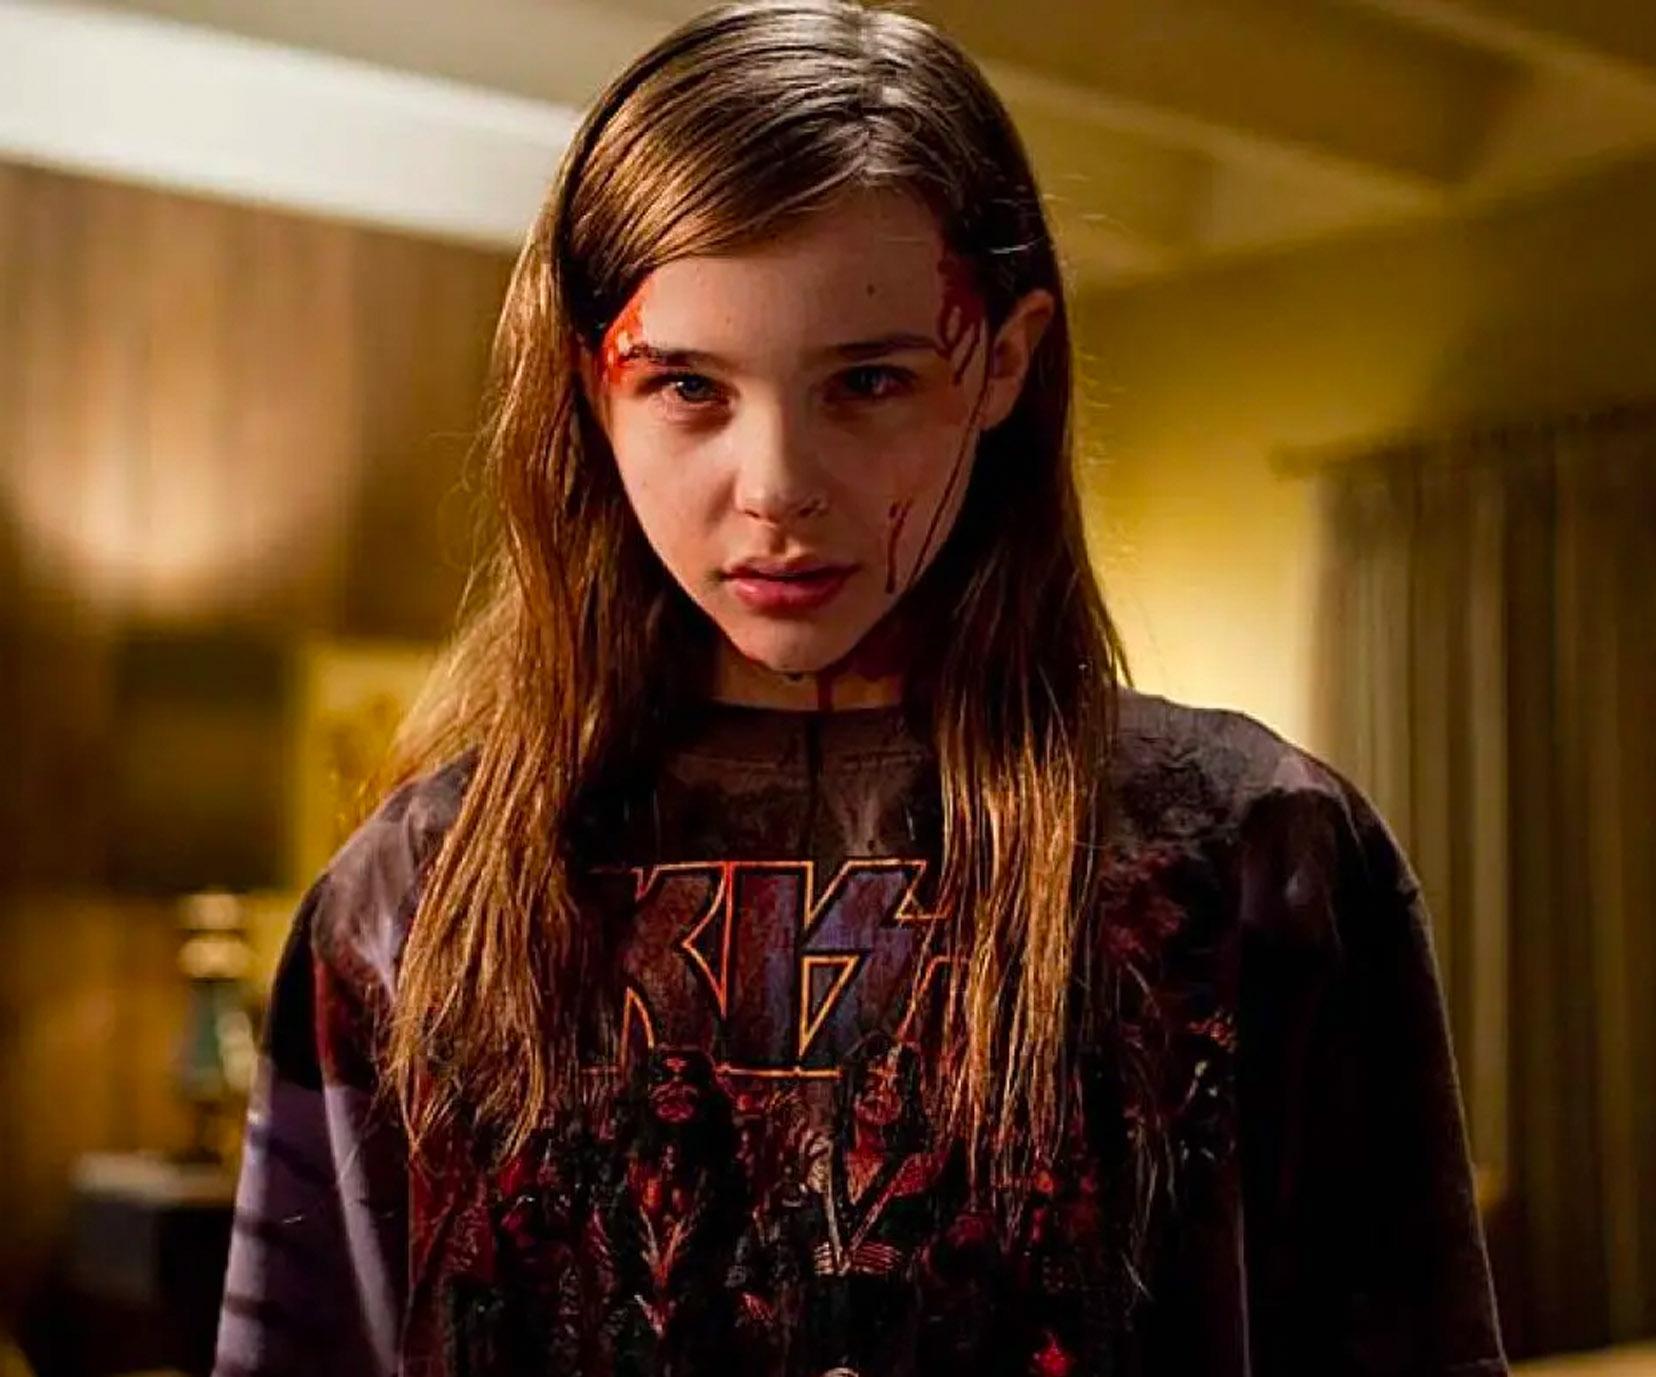 Chloe Grace Moretz i Let Me In fra 2010 (Paramount)